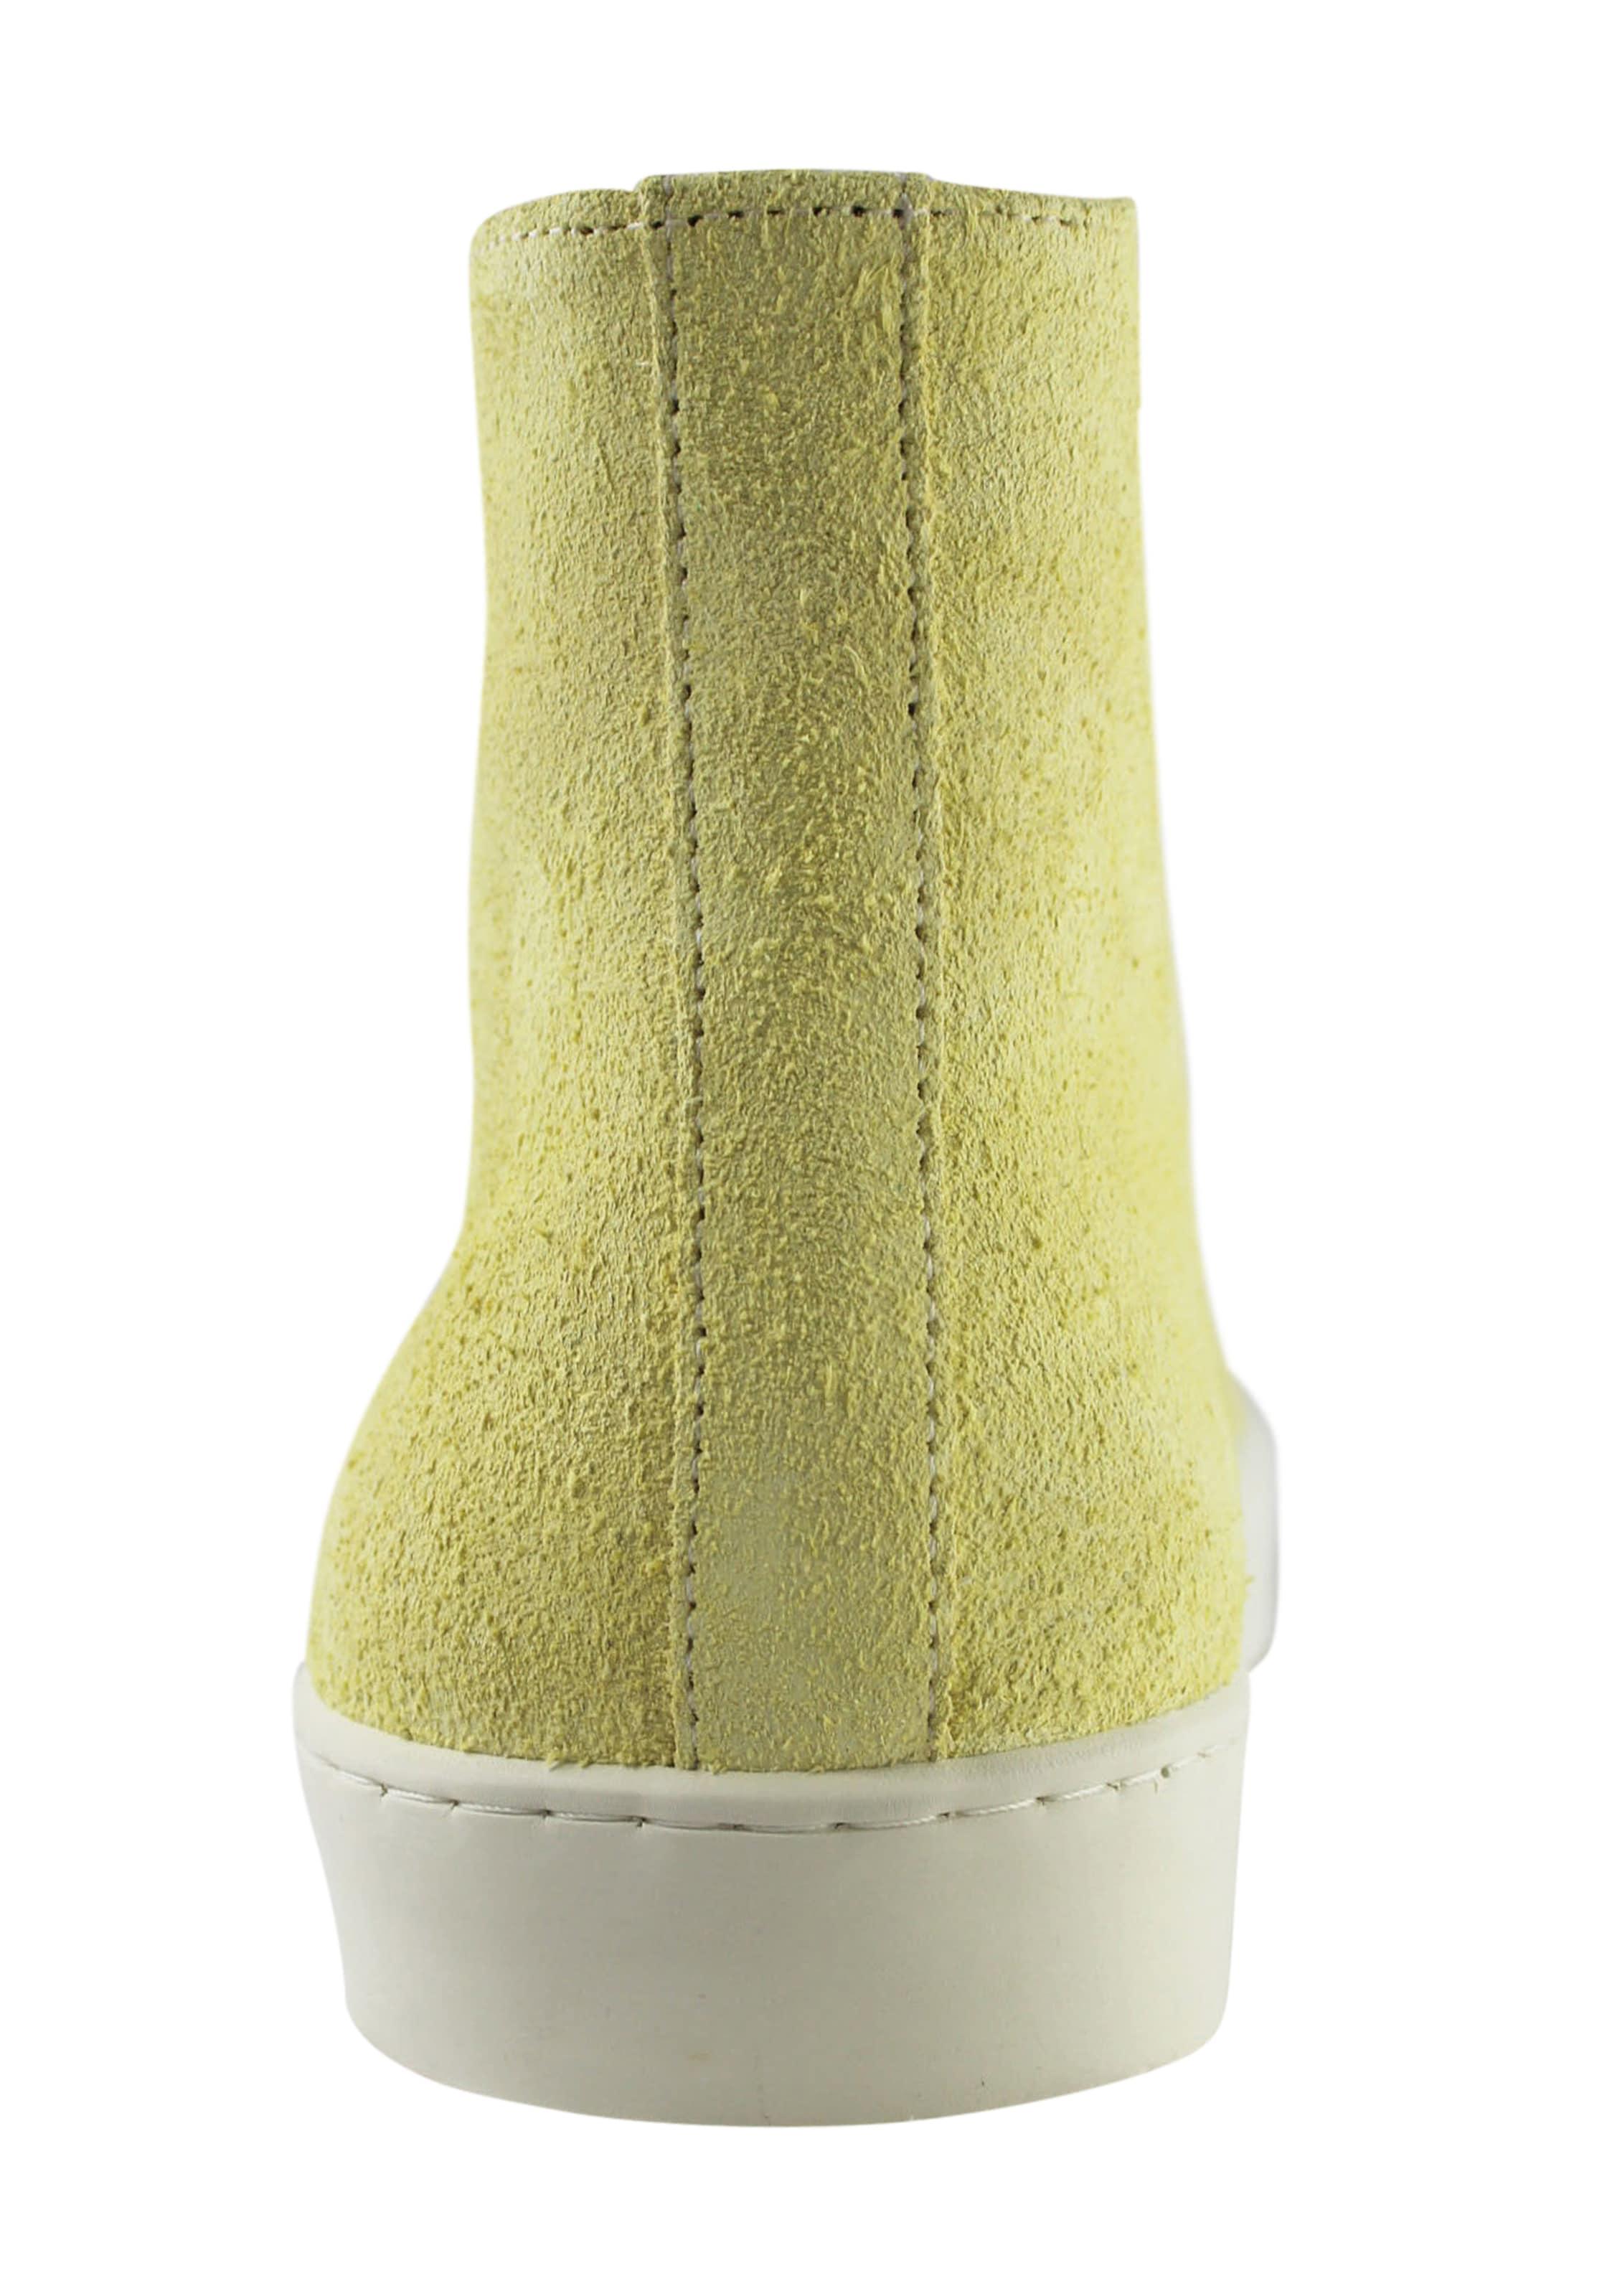 Footwear 'oak Ekn Schnürschuh High' Limone In FJuTlK1c53